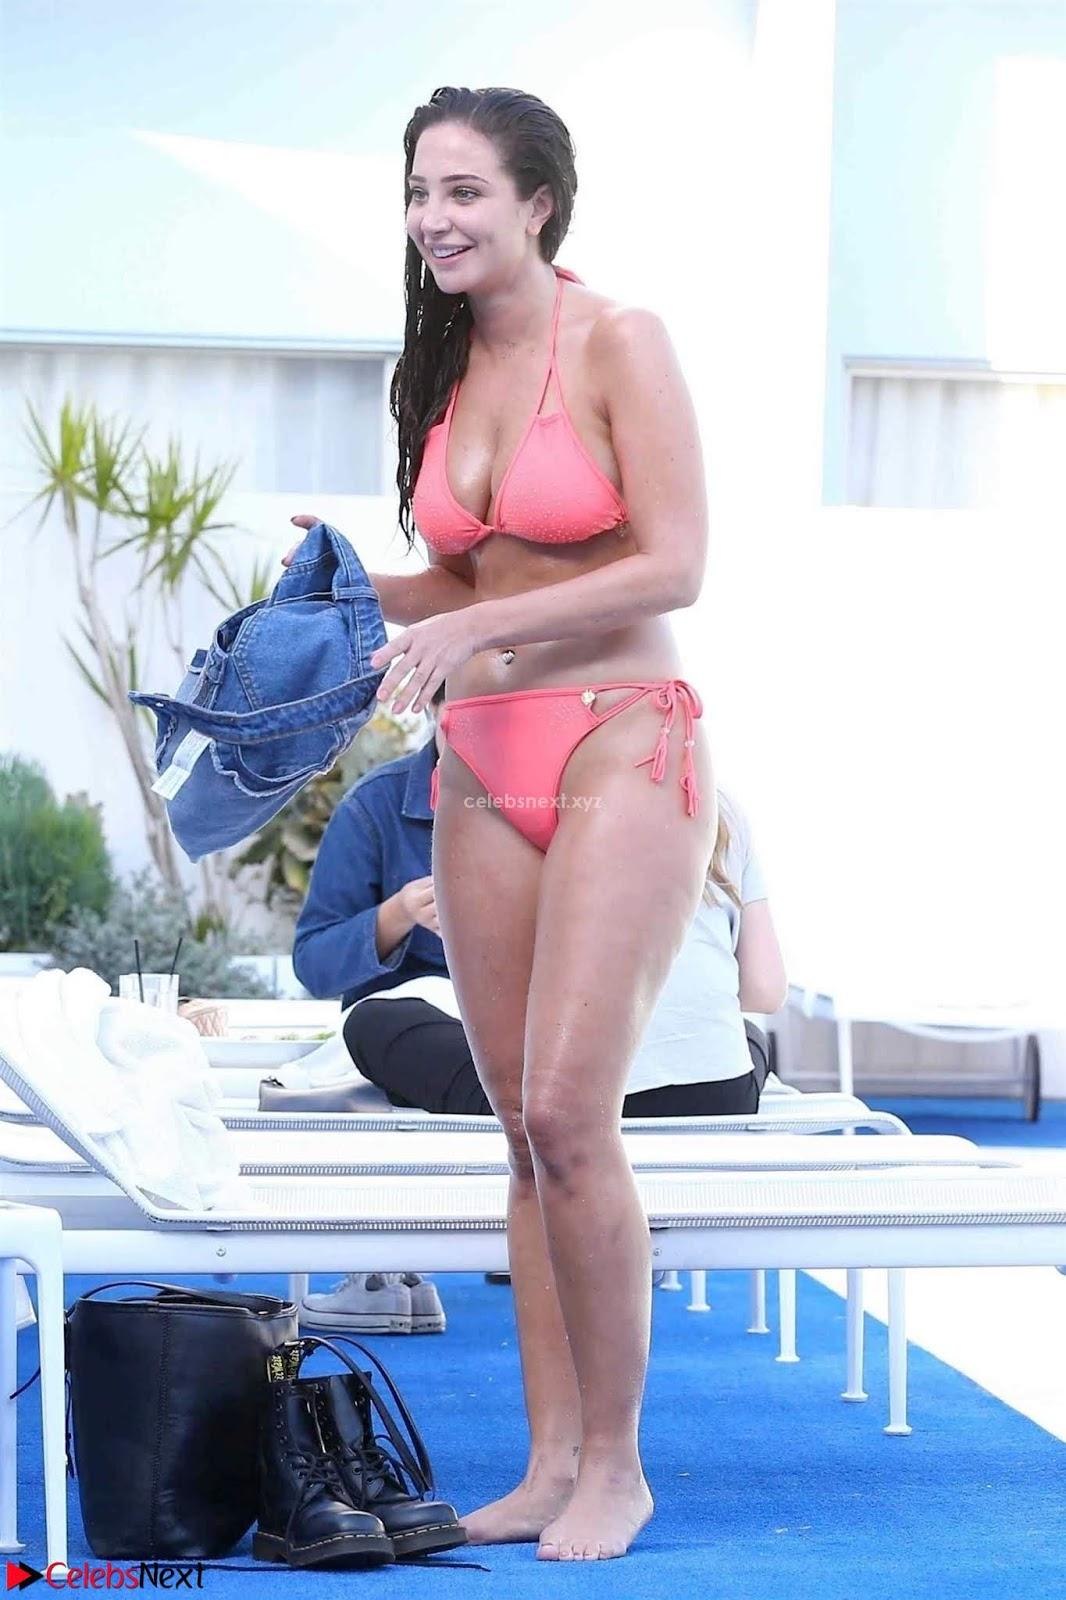 Tulisa Contostavlos in Wet Bikini Huge massive boobs Ass Nude ~ CelebsNext.xyz Exclusive Celebrity Pics